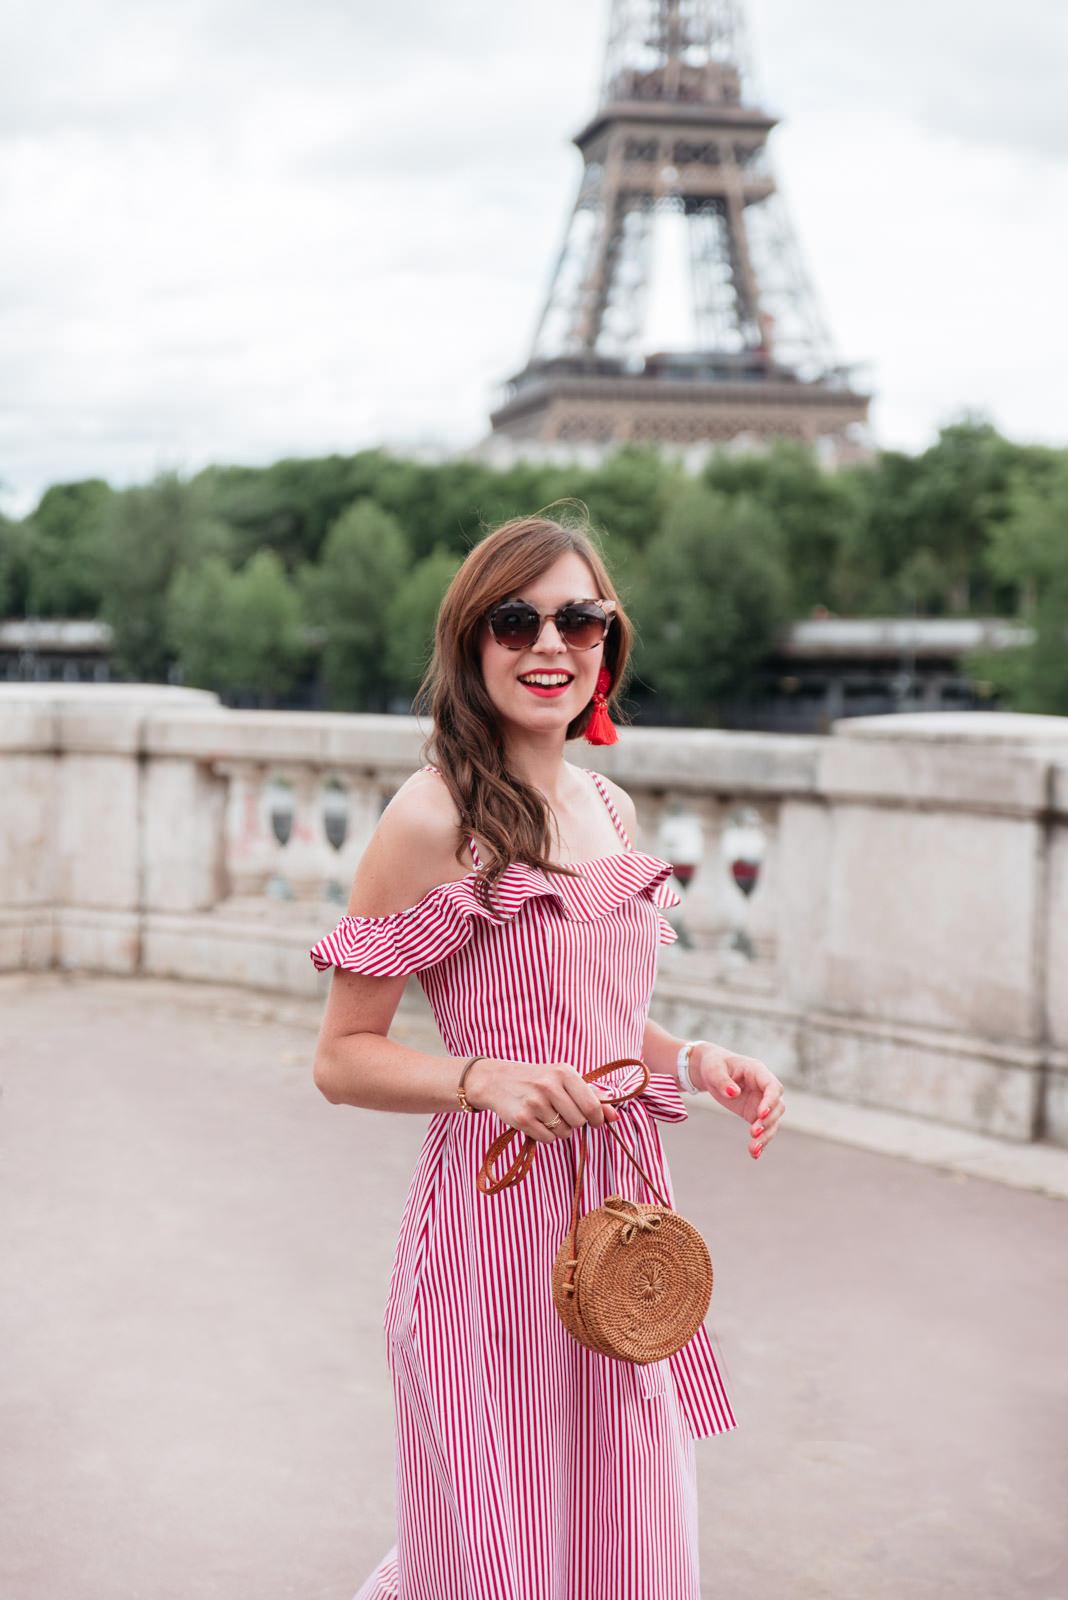 Blog-mode-And-The-City-Looks-Robe-Mango-RAyee-Tour-Eiffel-4